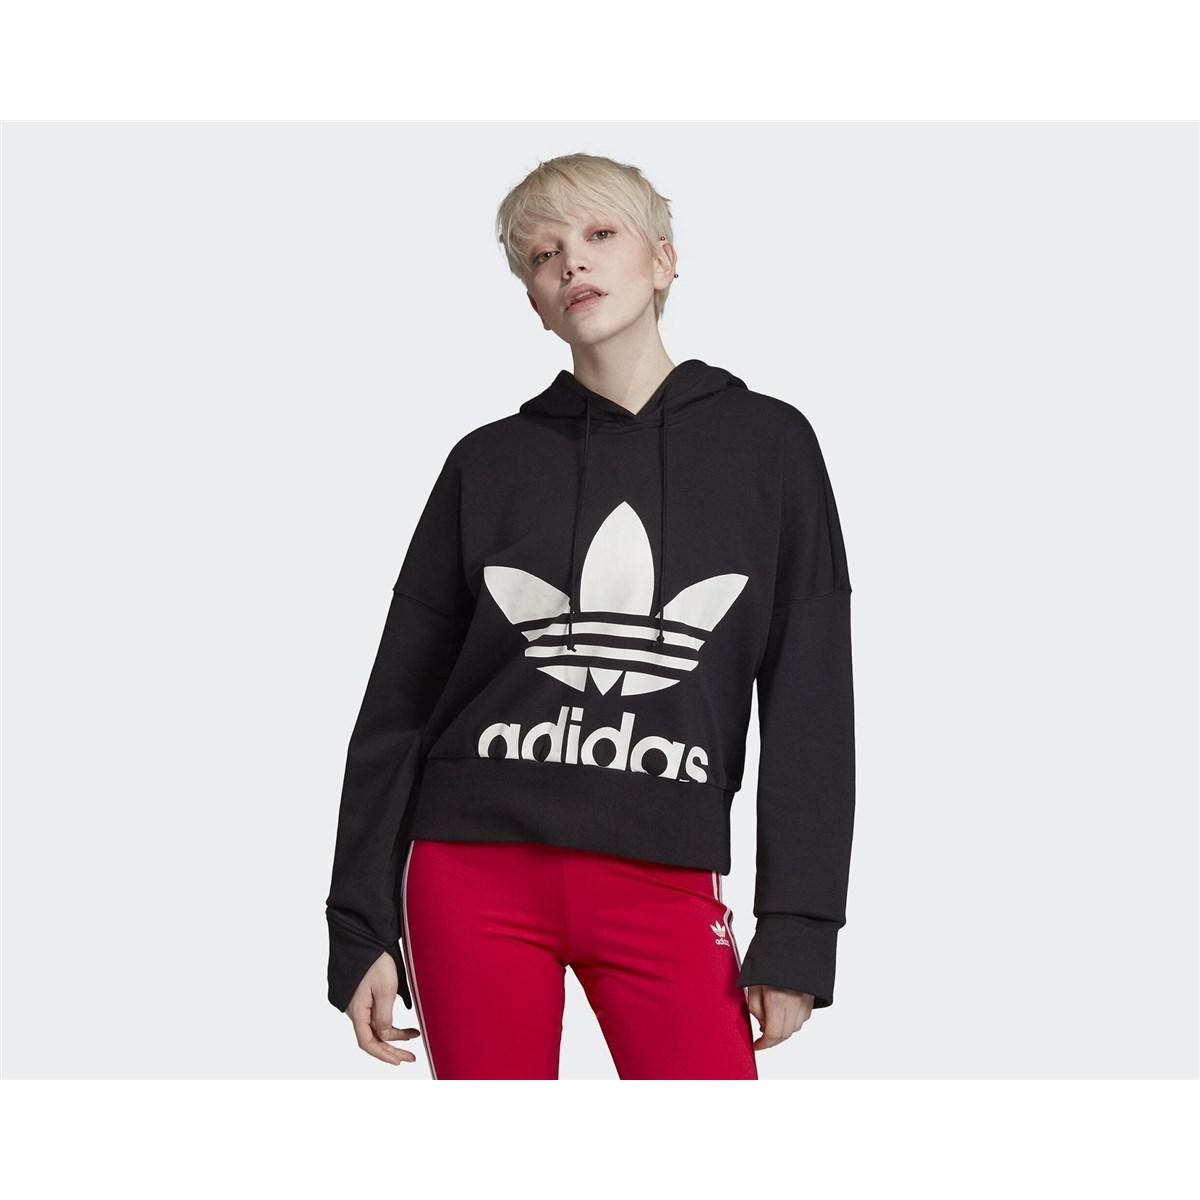 Cropped Kadın Siyah Sweatshirt